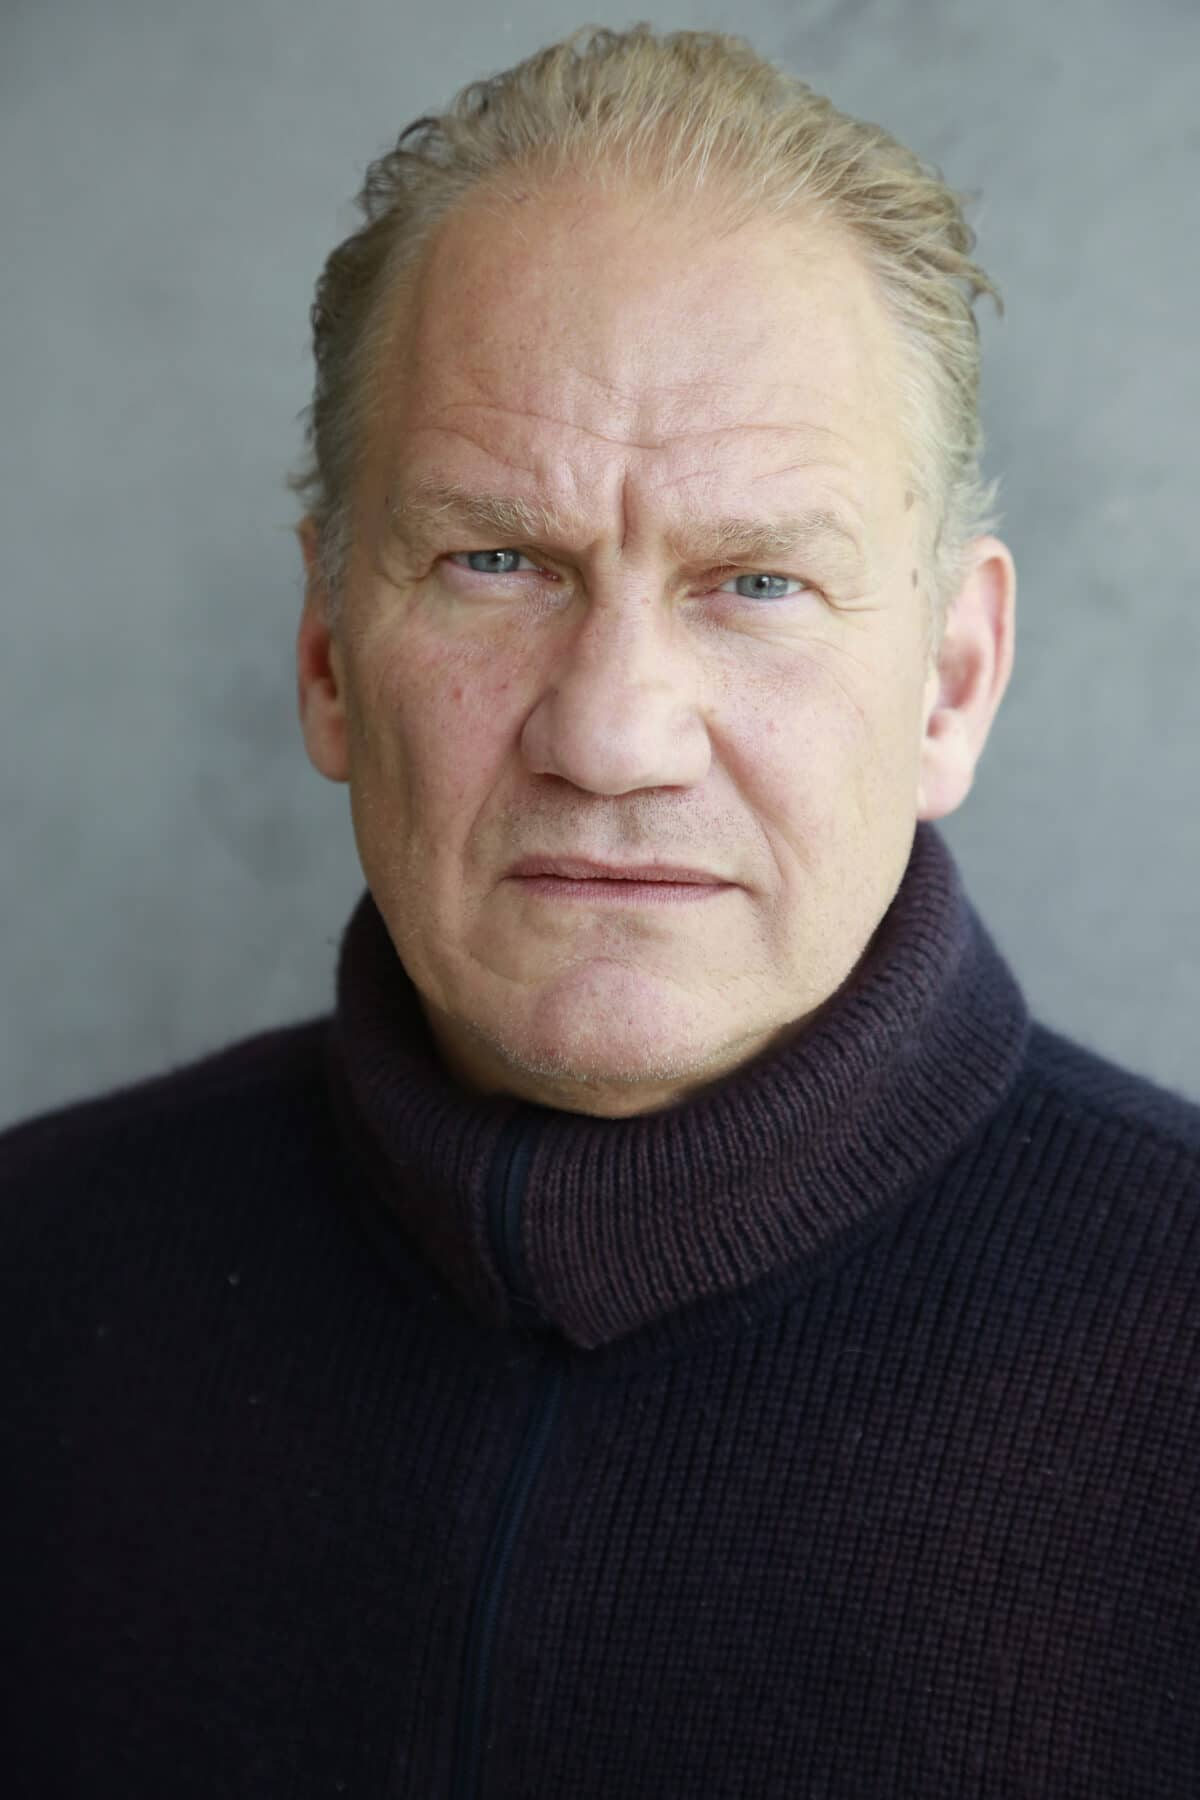 Joachim Paul Assboeck